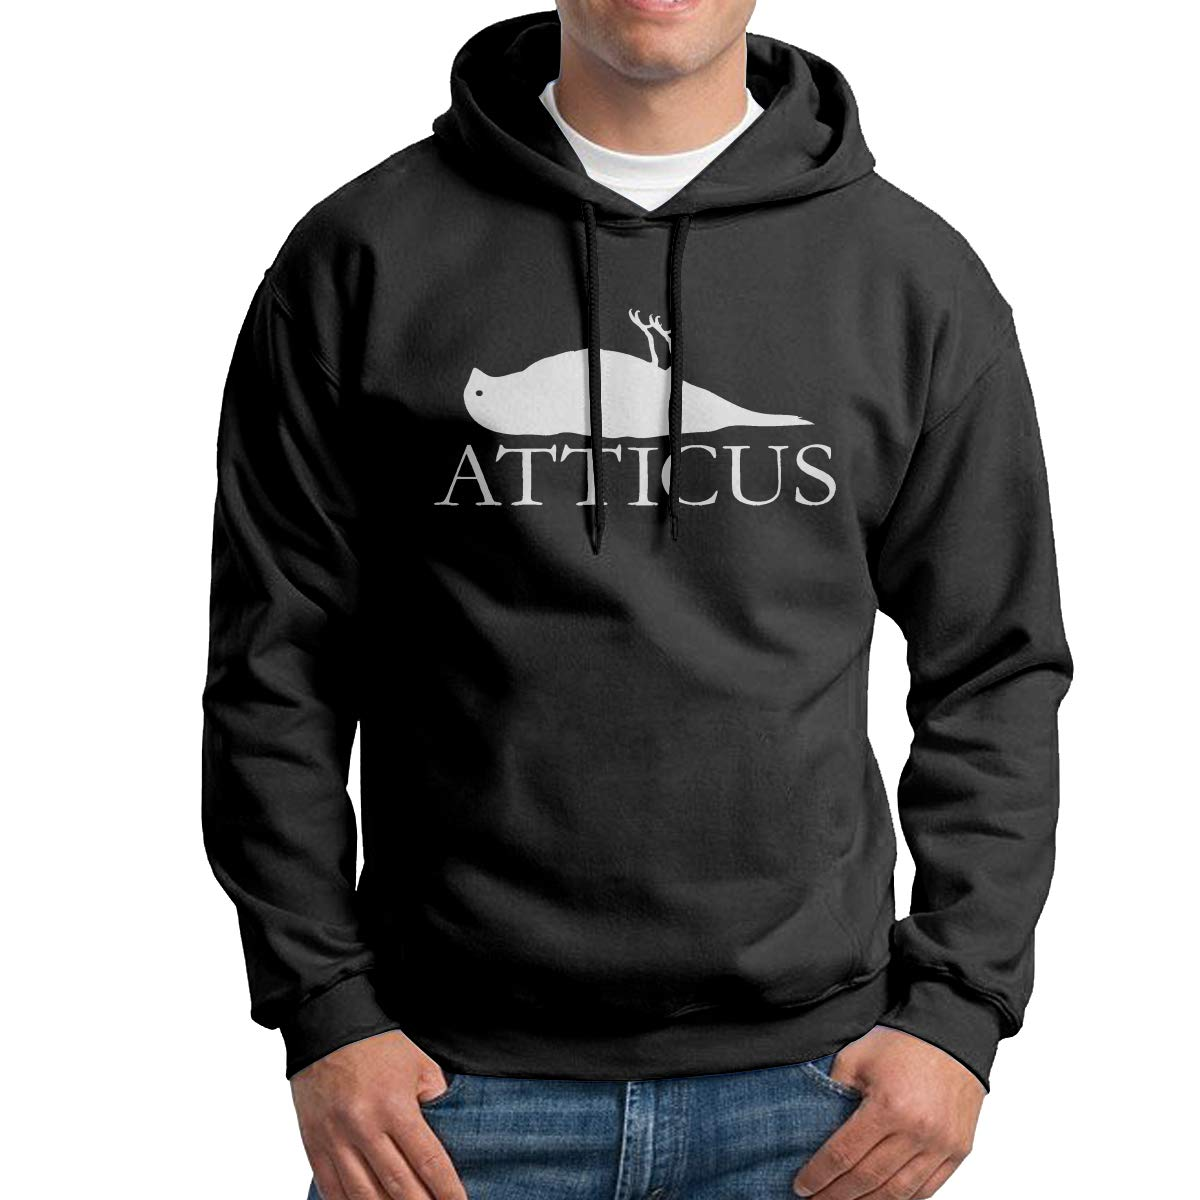 Men Atticus Classic Young Boy Pocketless Sweatshirt Winter Summer Coat Streetwear Gym Jogger Hoodies Sweatshirts